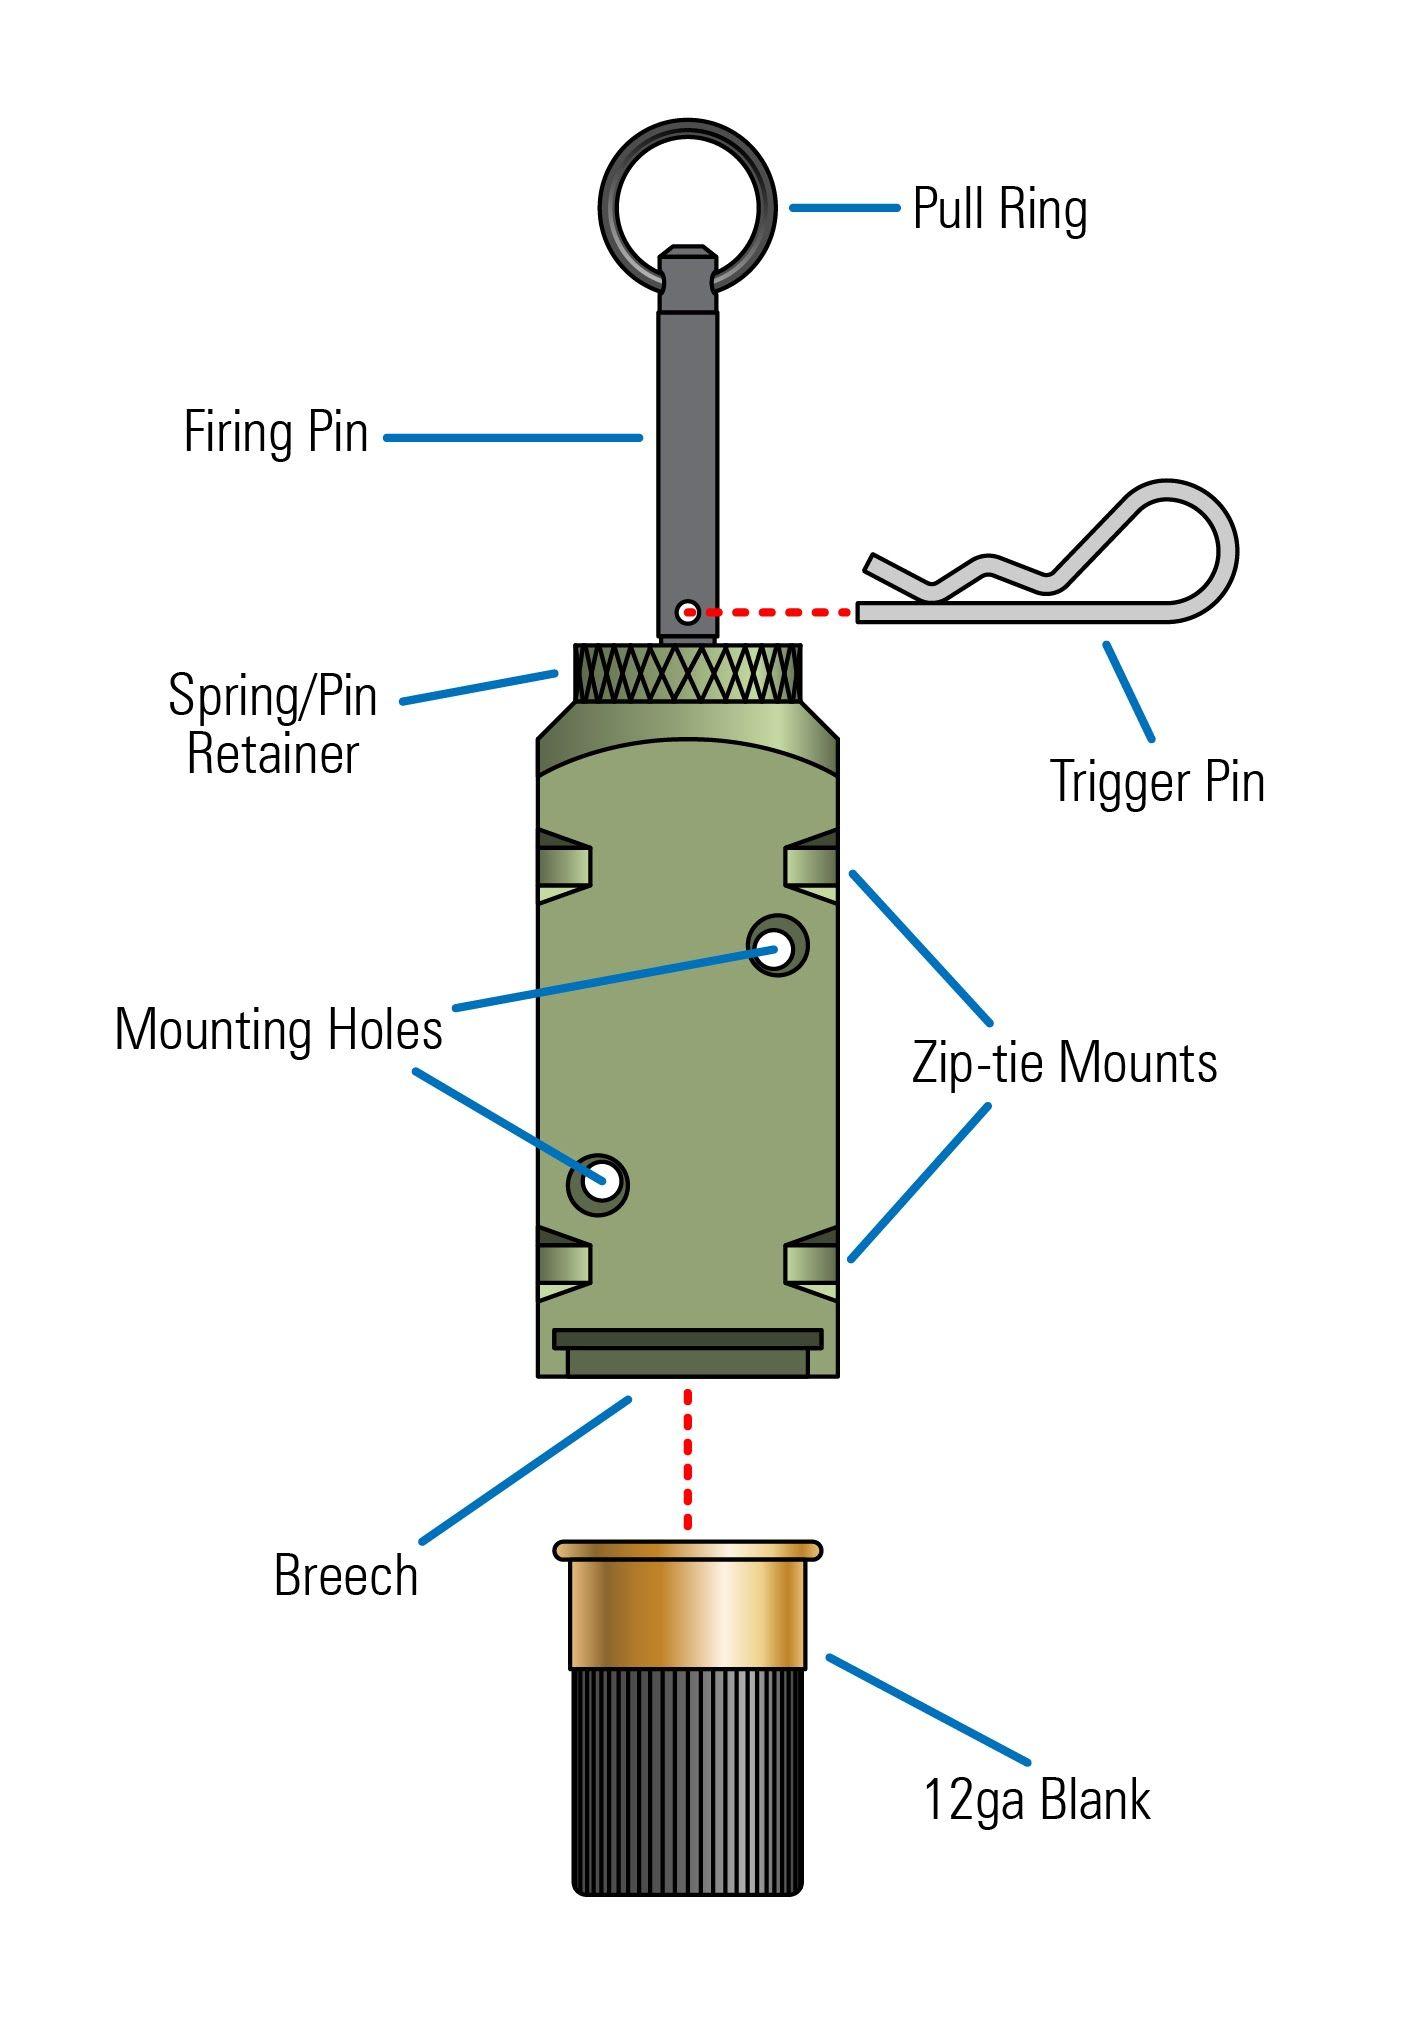 small resolution of fithops 12 ga tripwire alarm 30